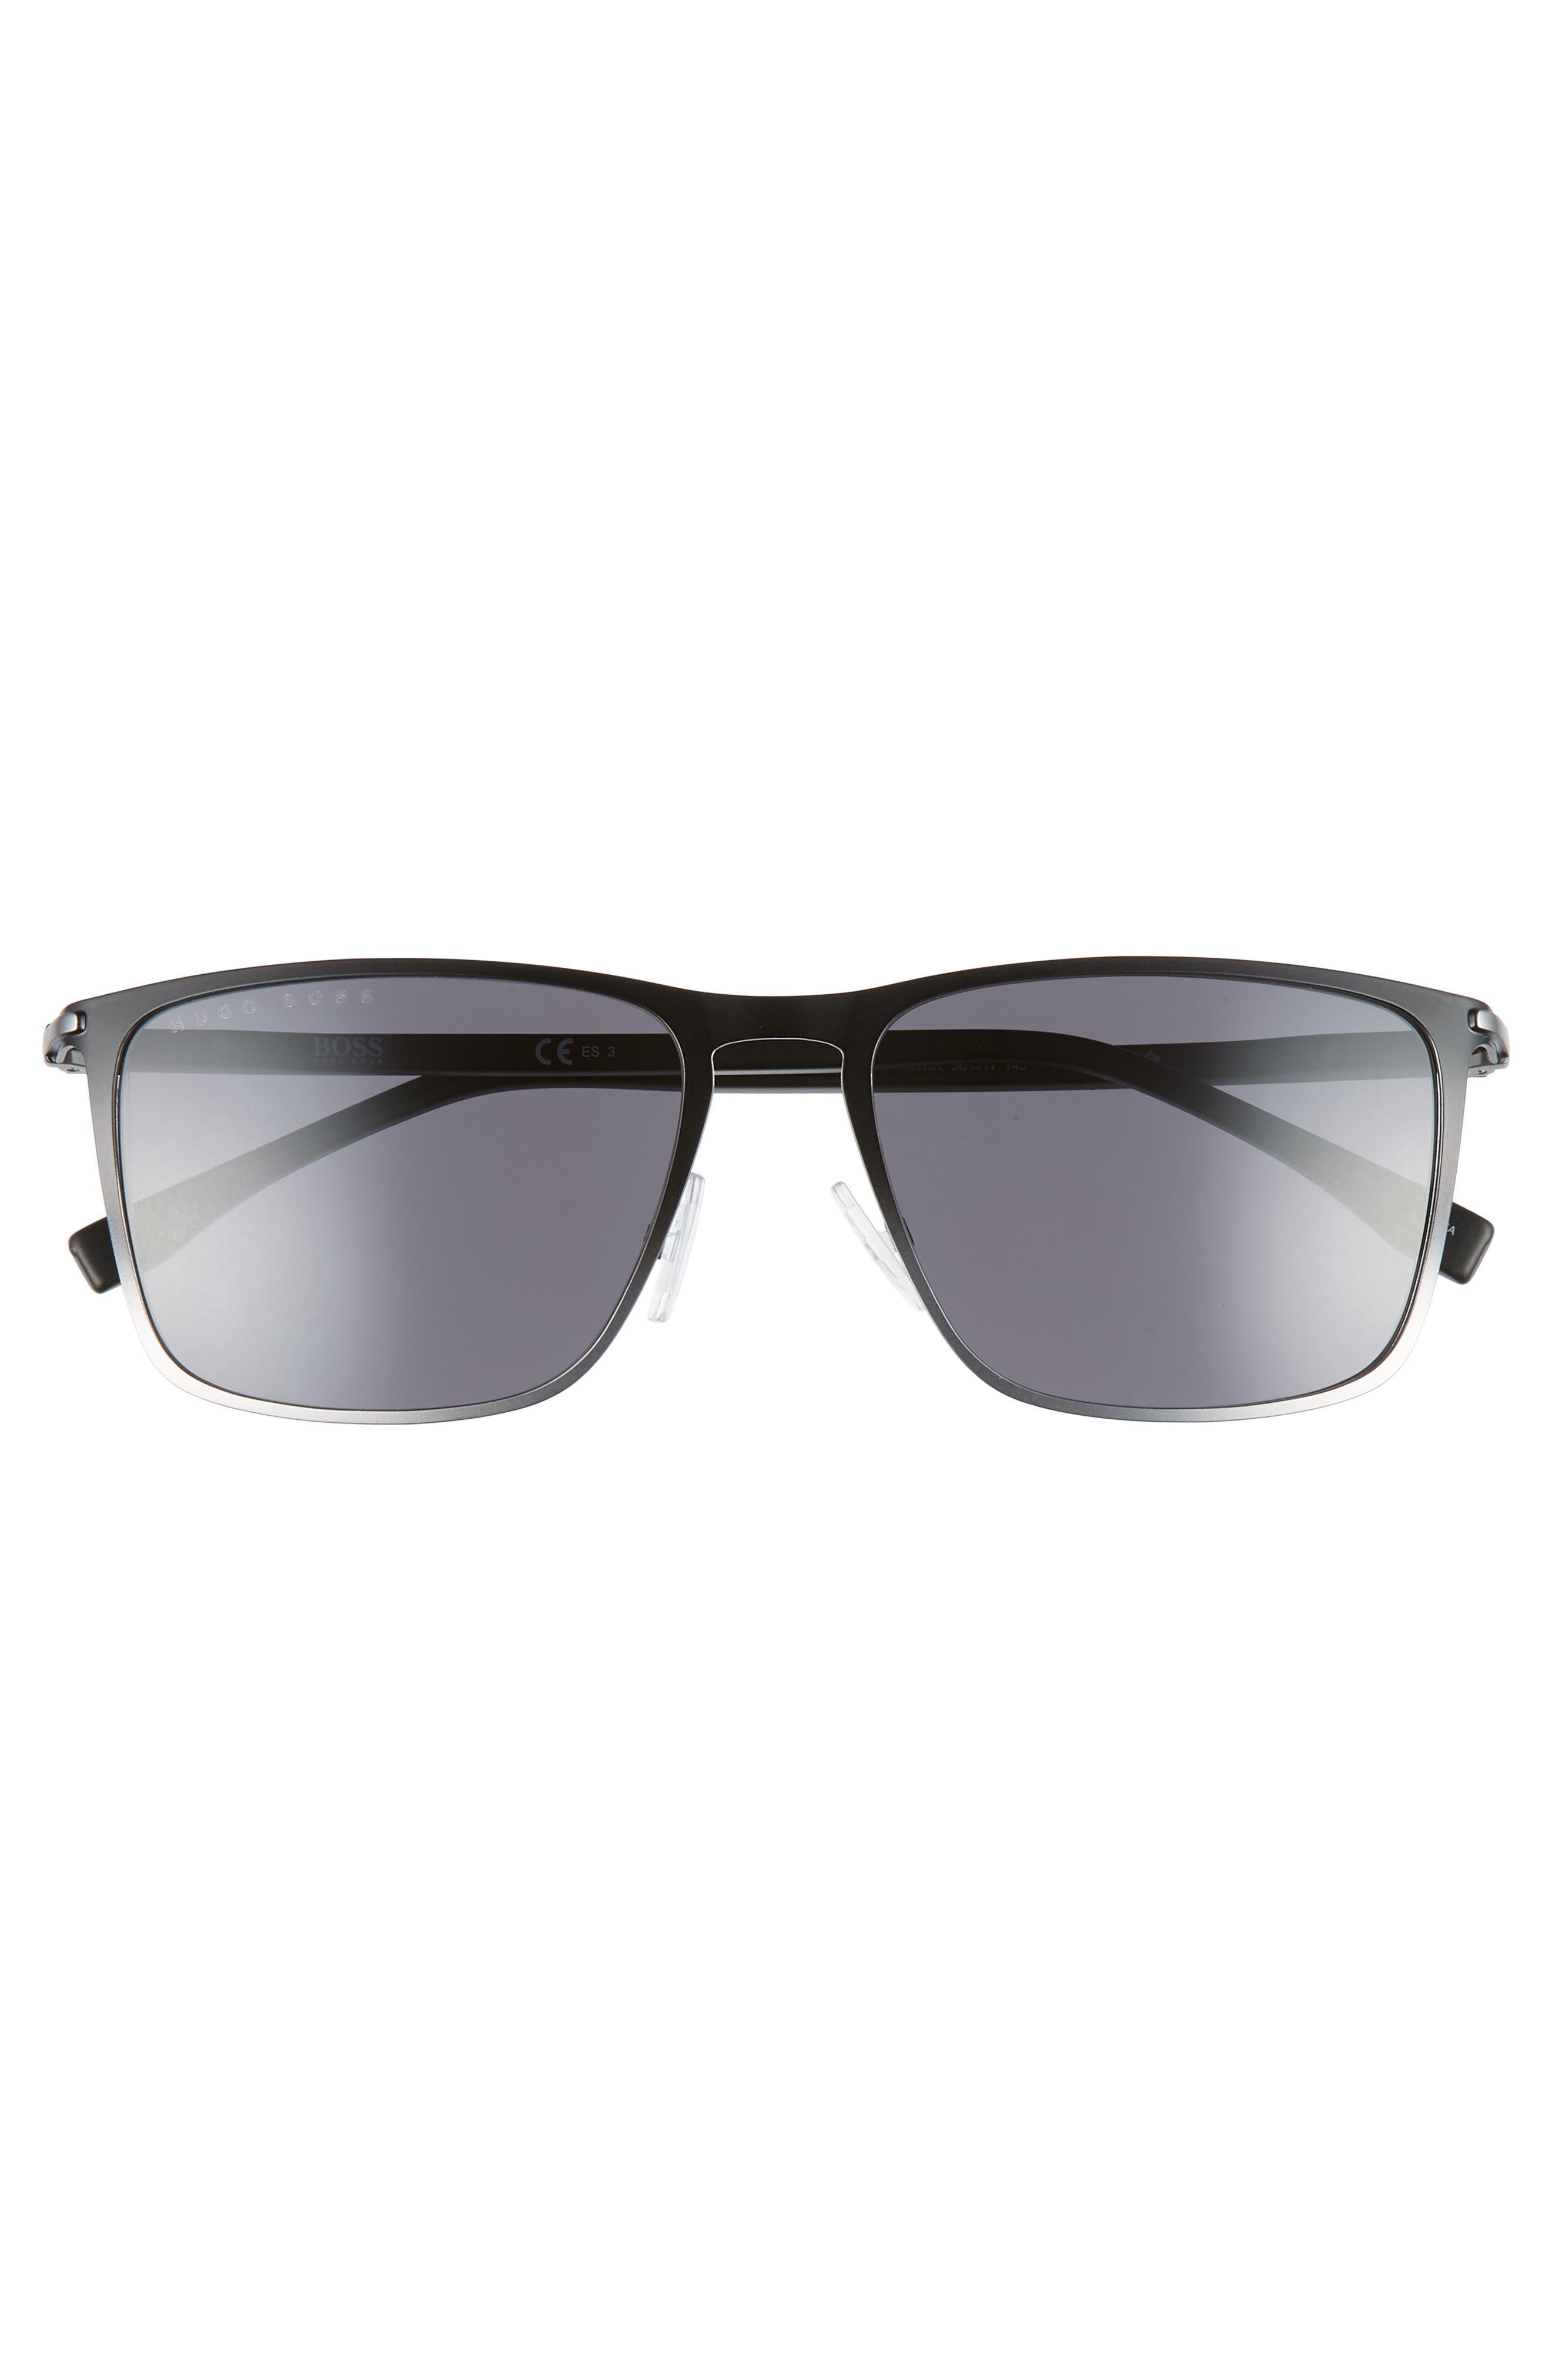 56mm Rectangular Sunglasses,                             Alternate thumbnail 2, color,                             BLACK RUTHENIUM